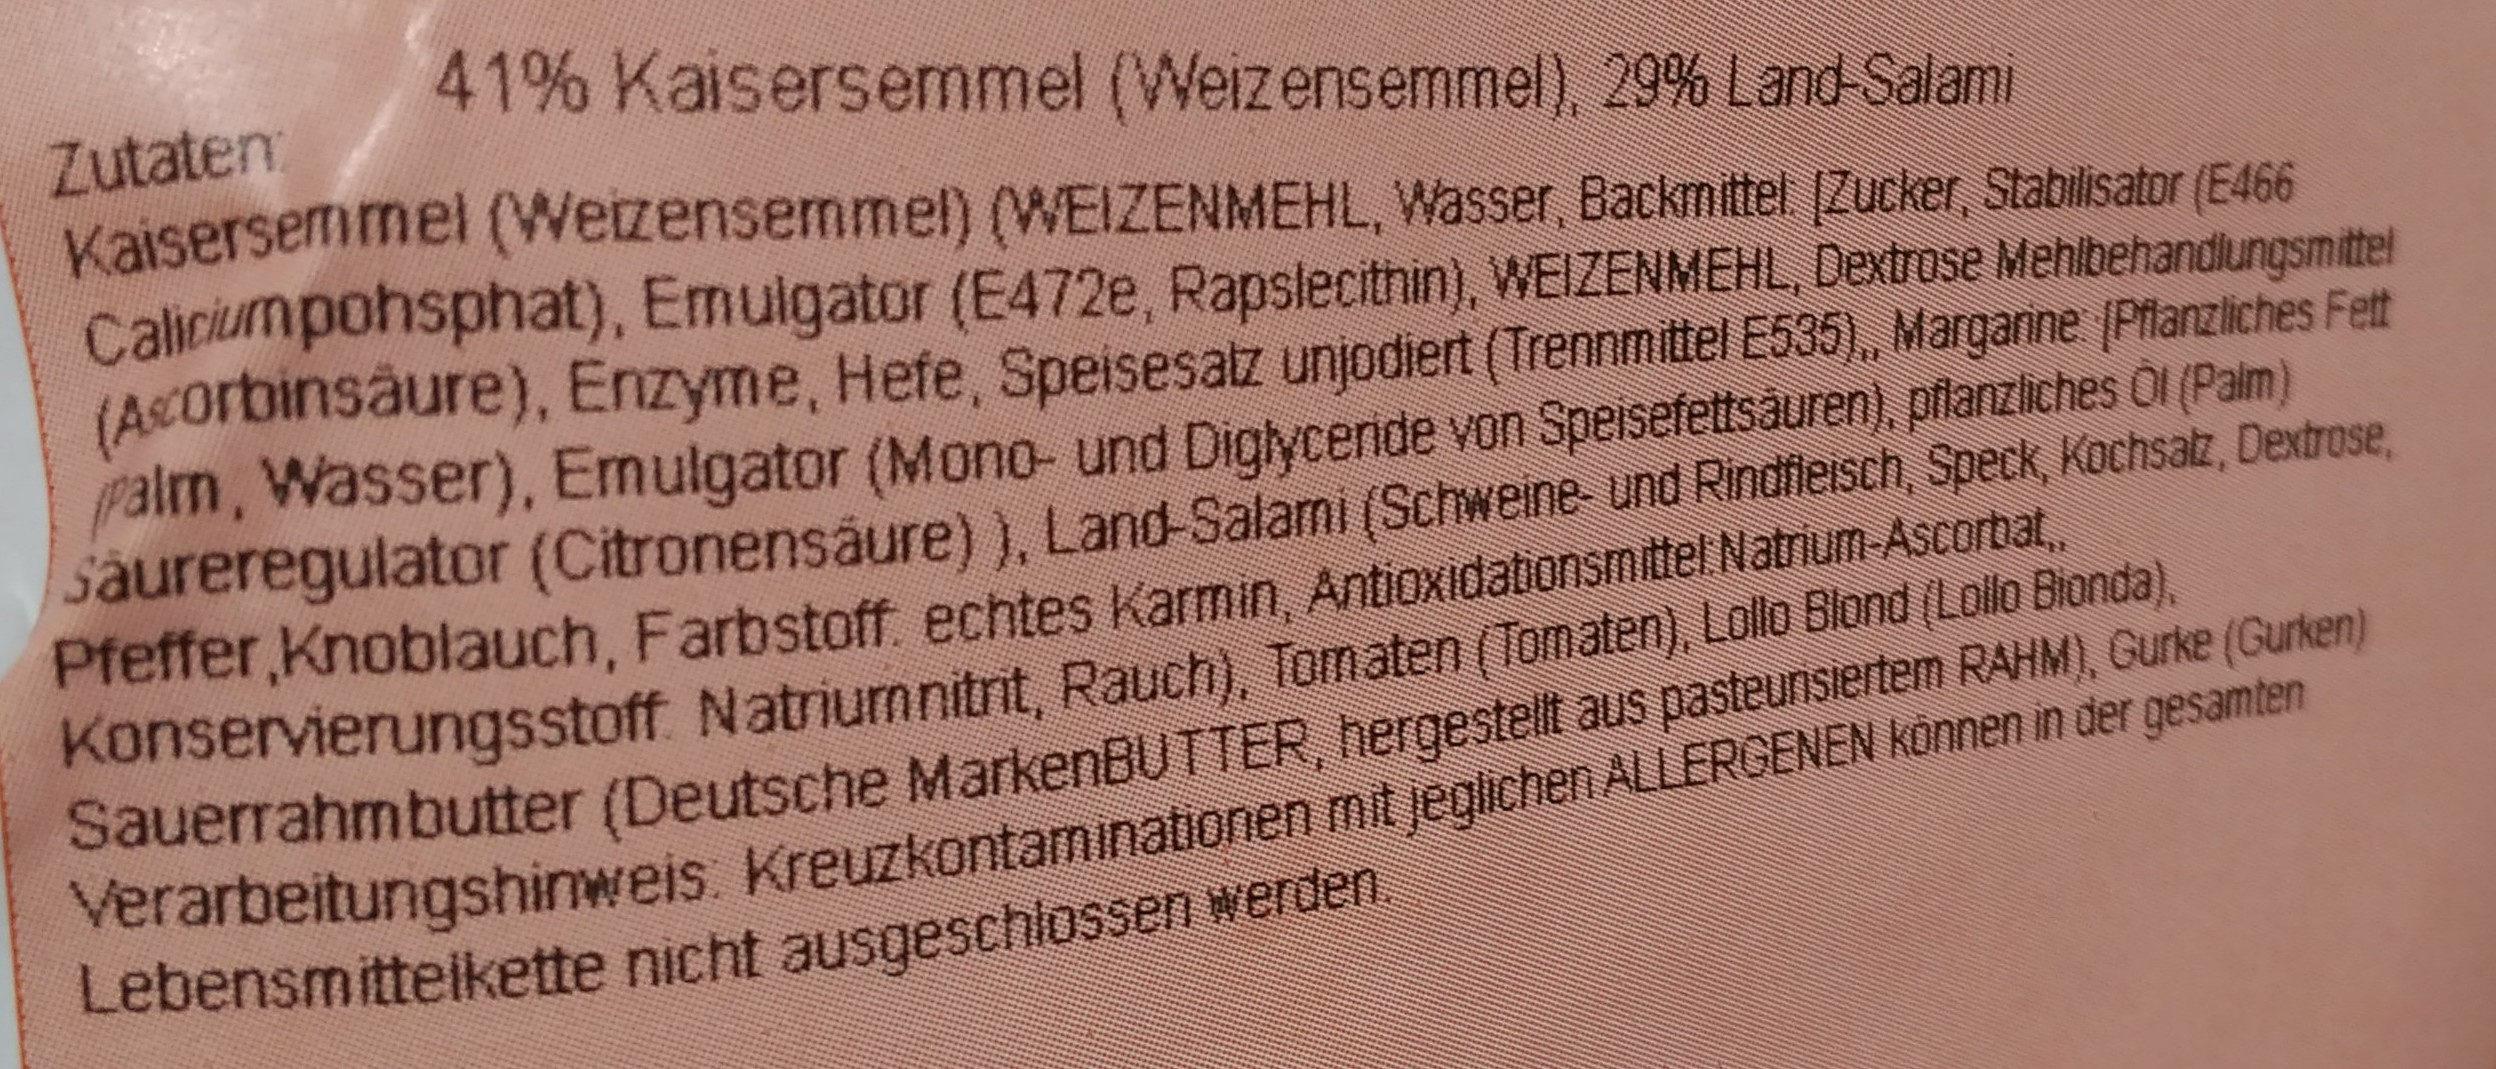 Kaisersemmel Salami - Inhaltsstoffe